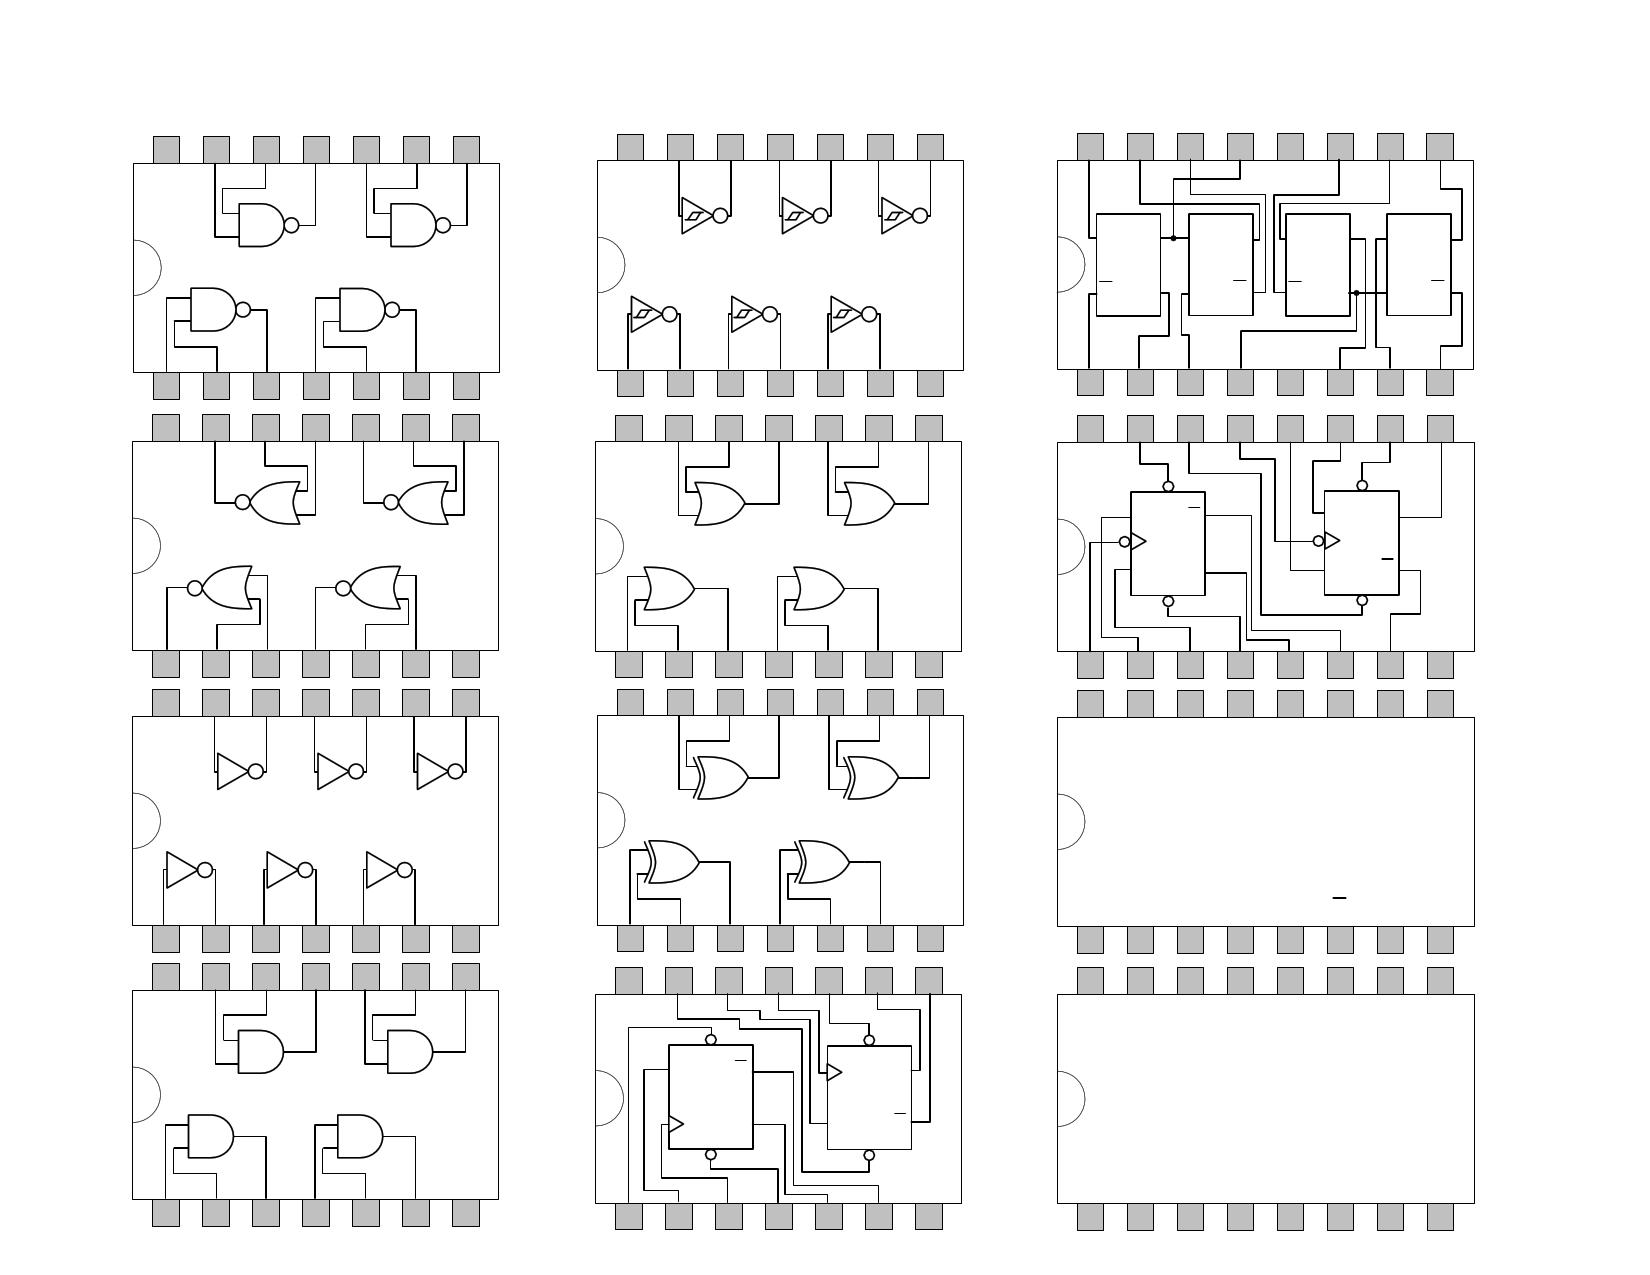 74251  u30c7 u30fc u30bf u30b7 u30fc u30c8 pdf